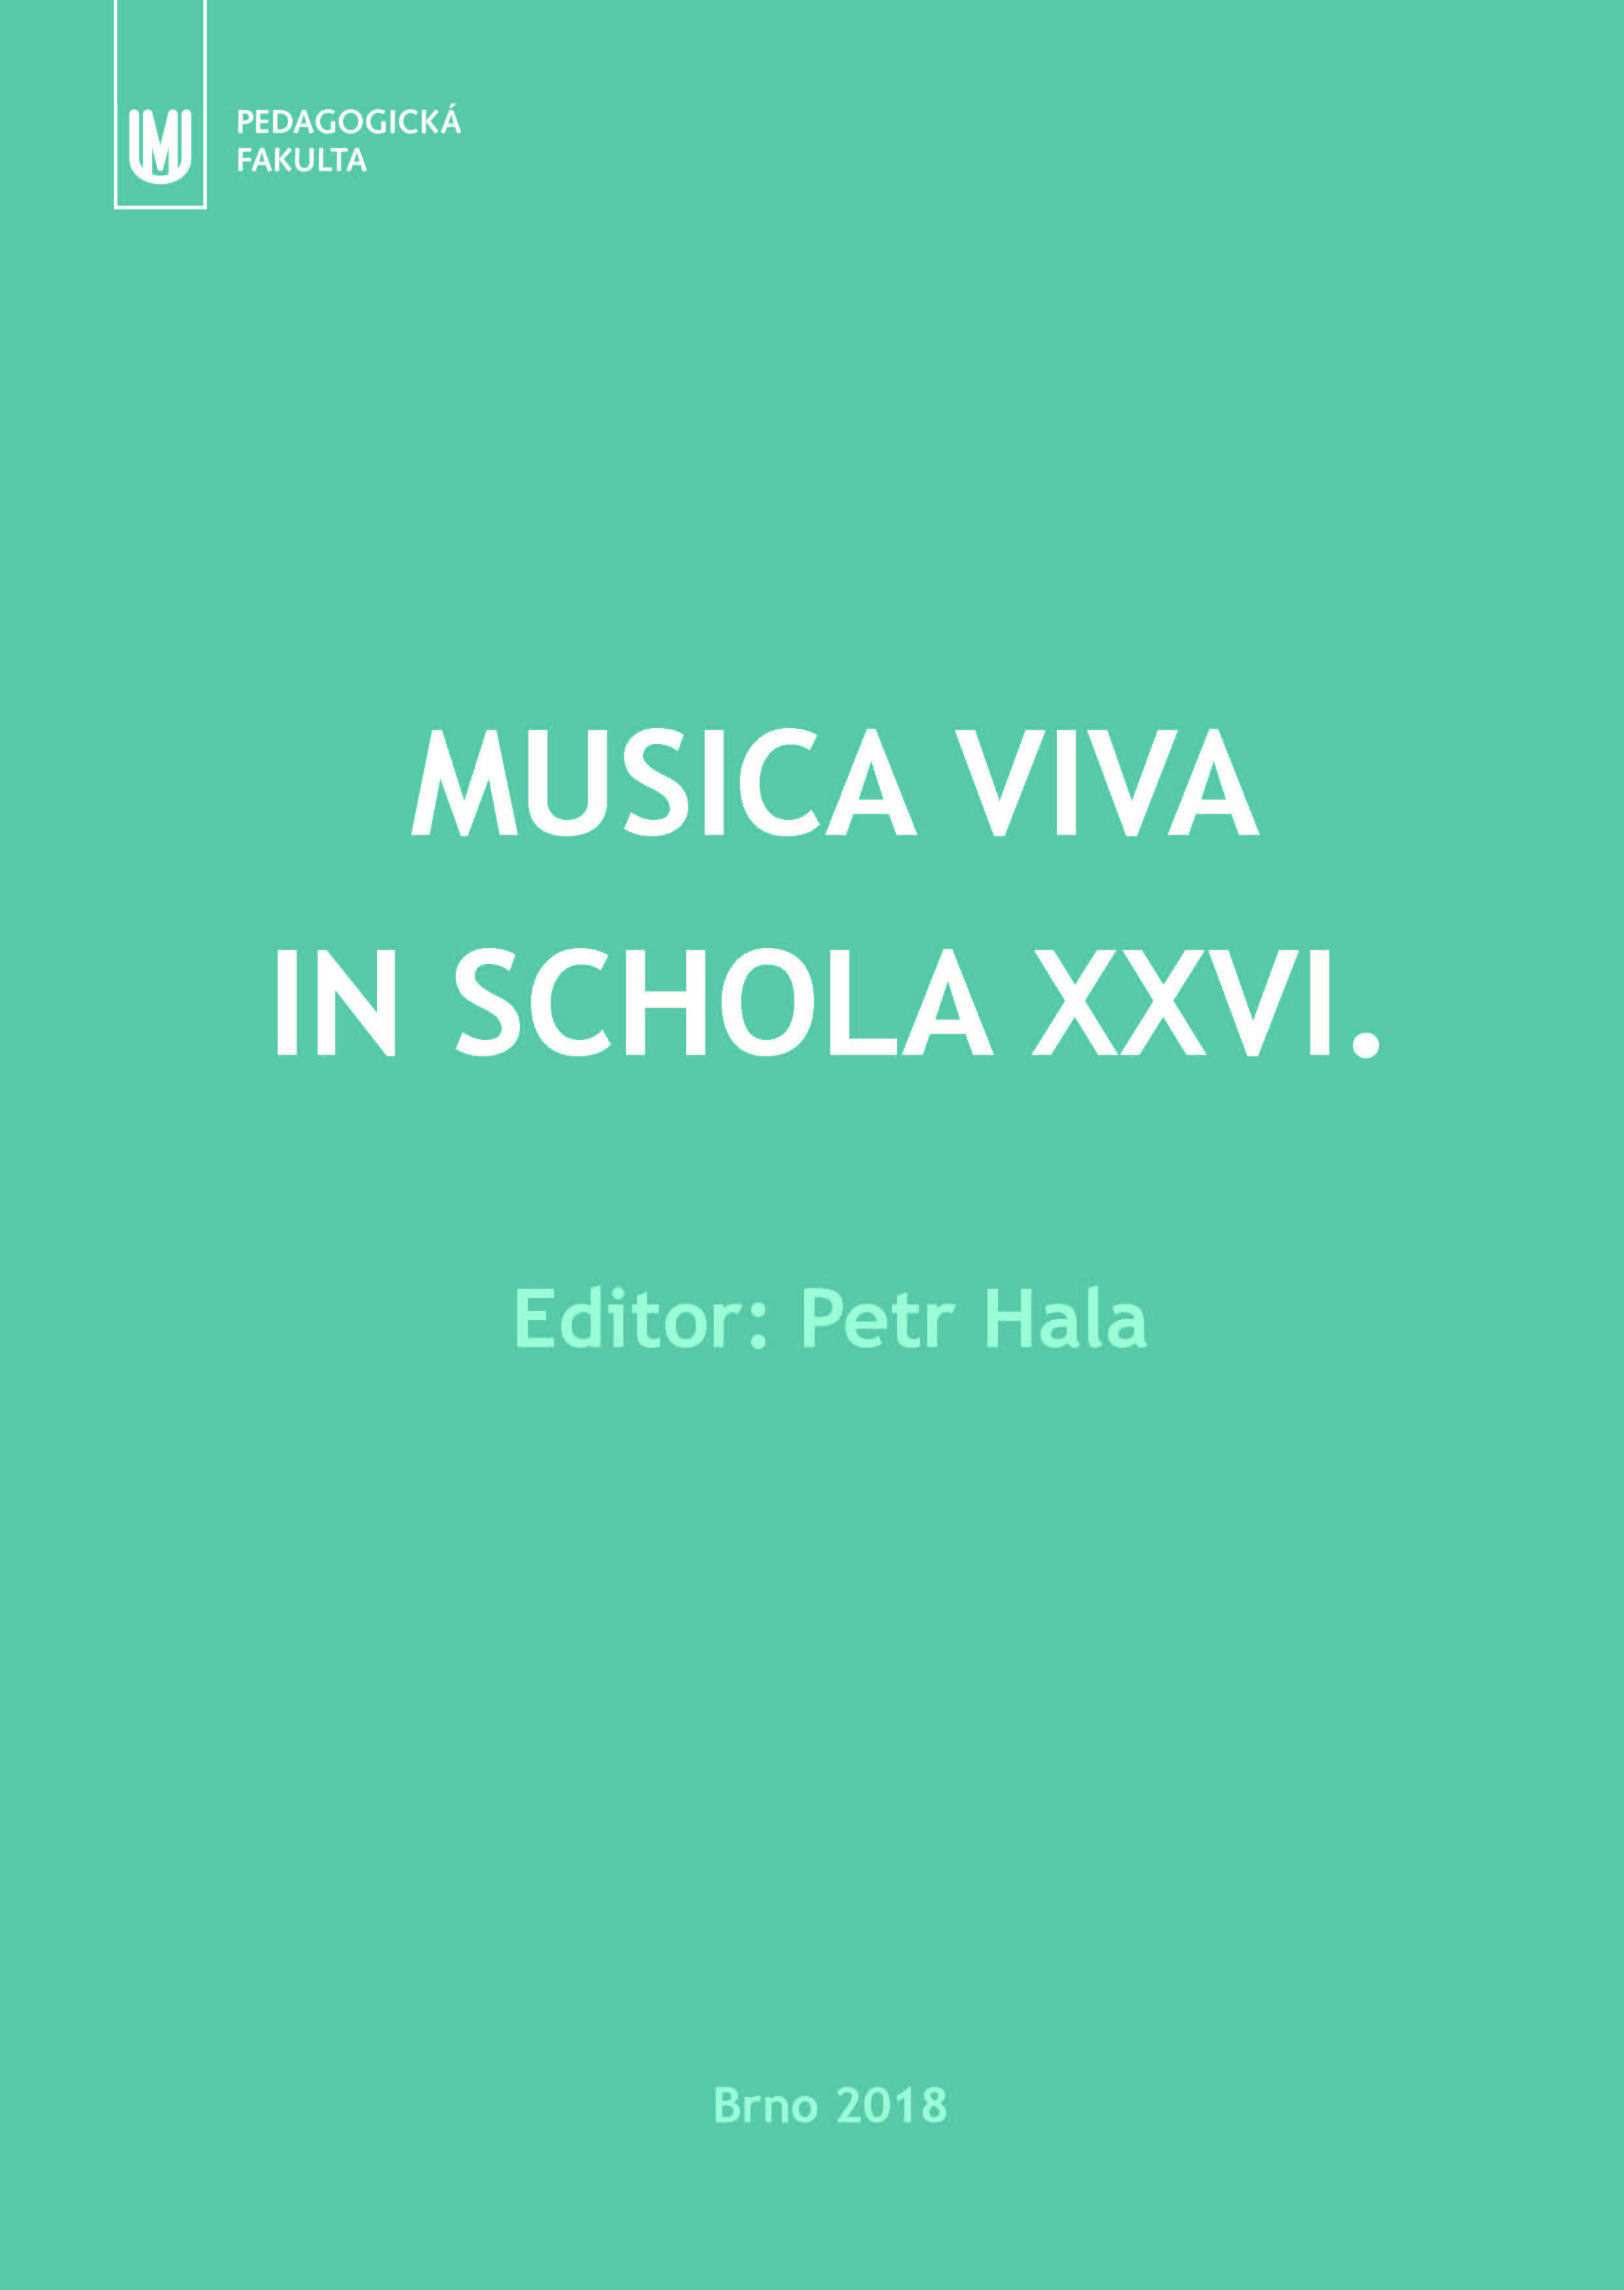 Obálka pro Musica viva in schola XXVI.